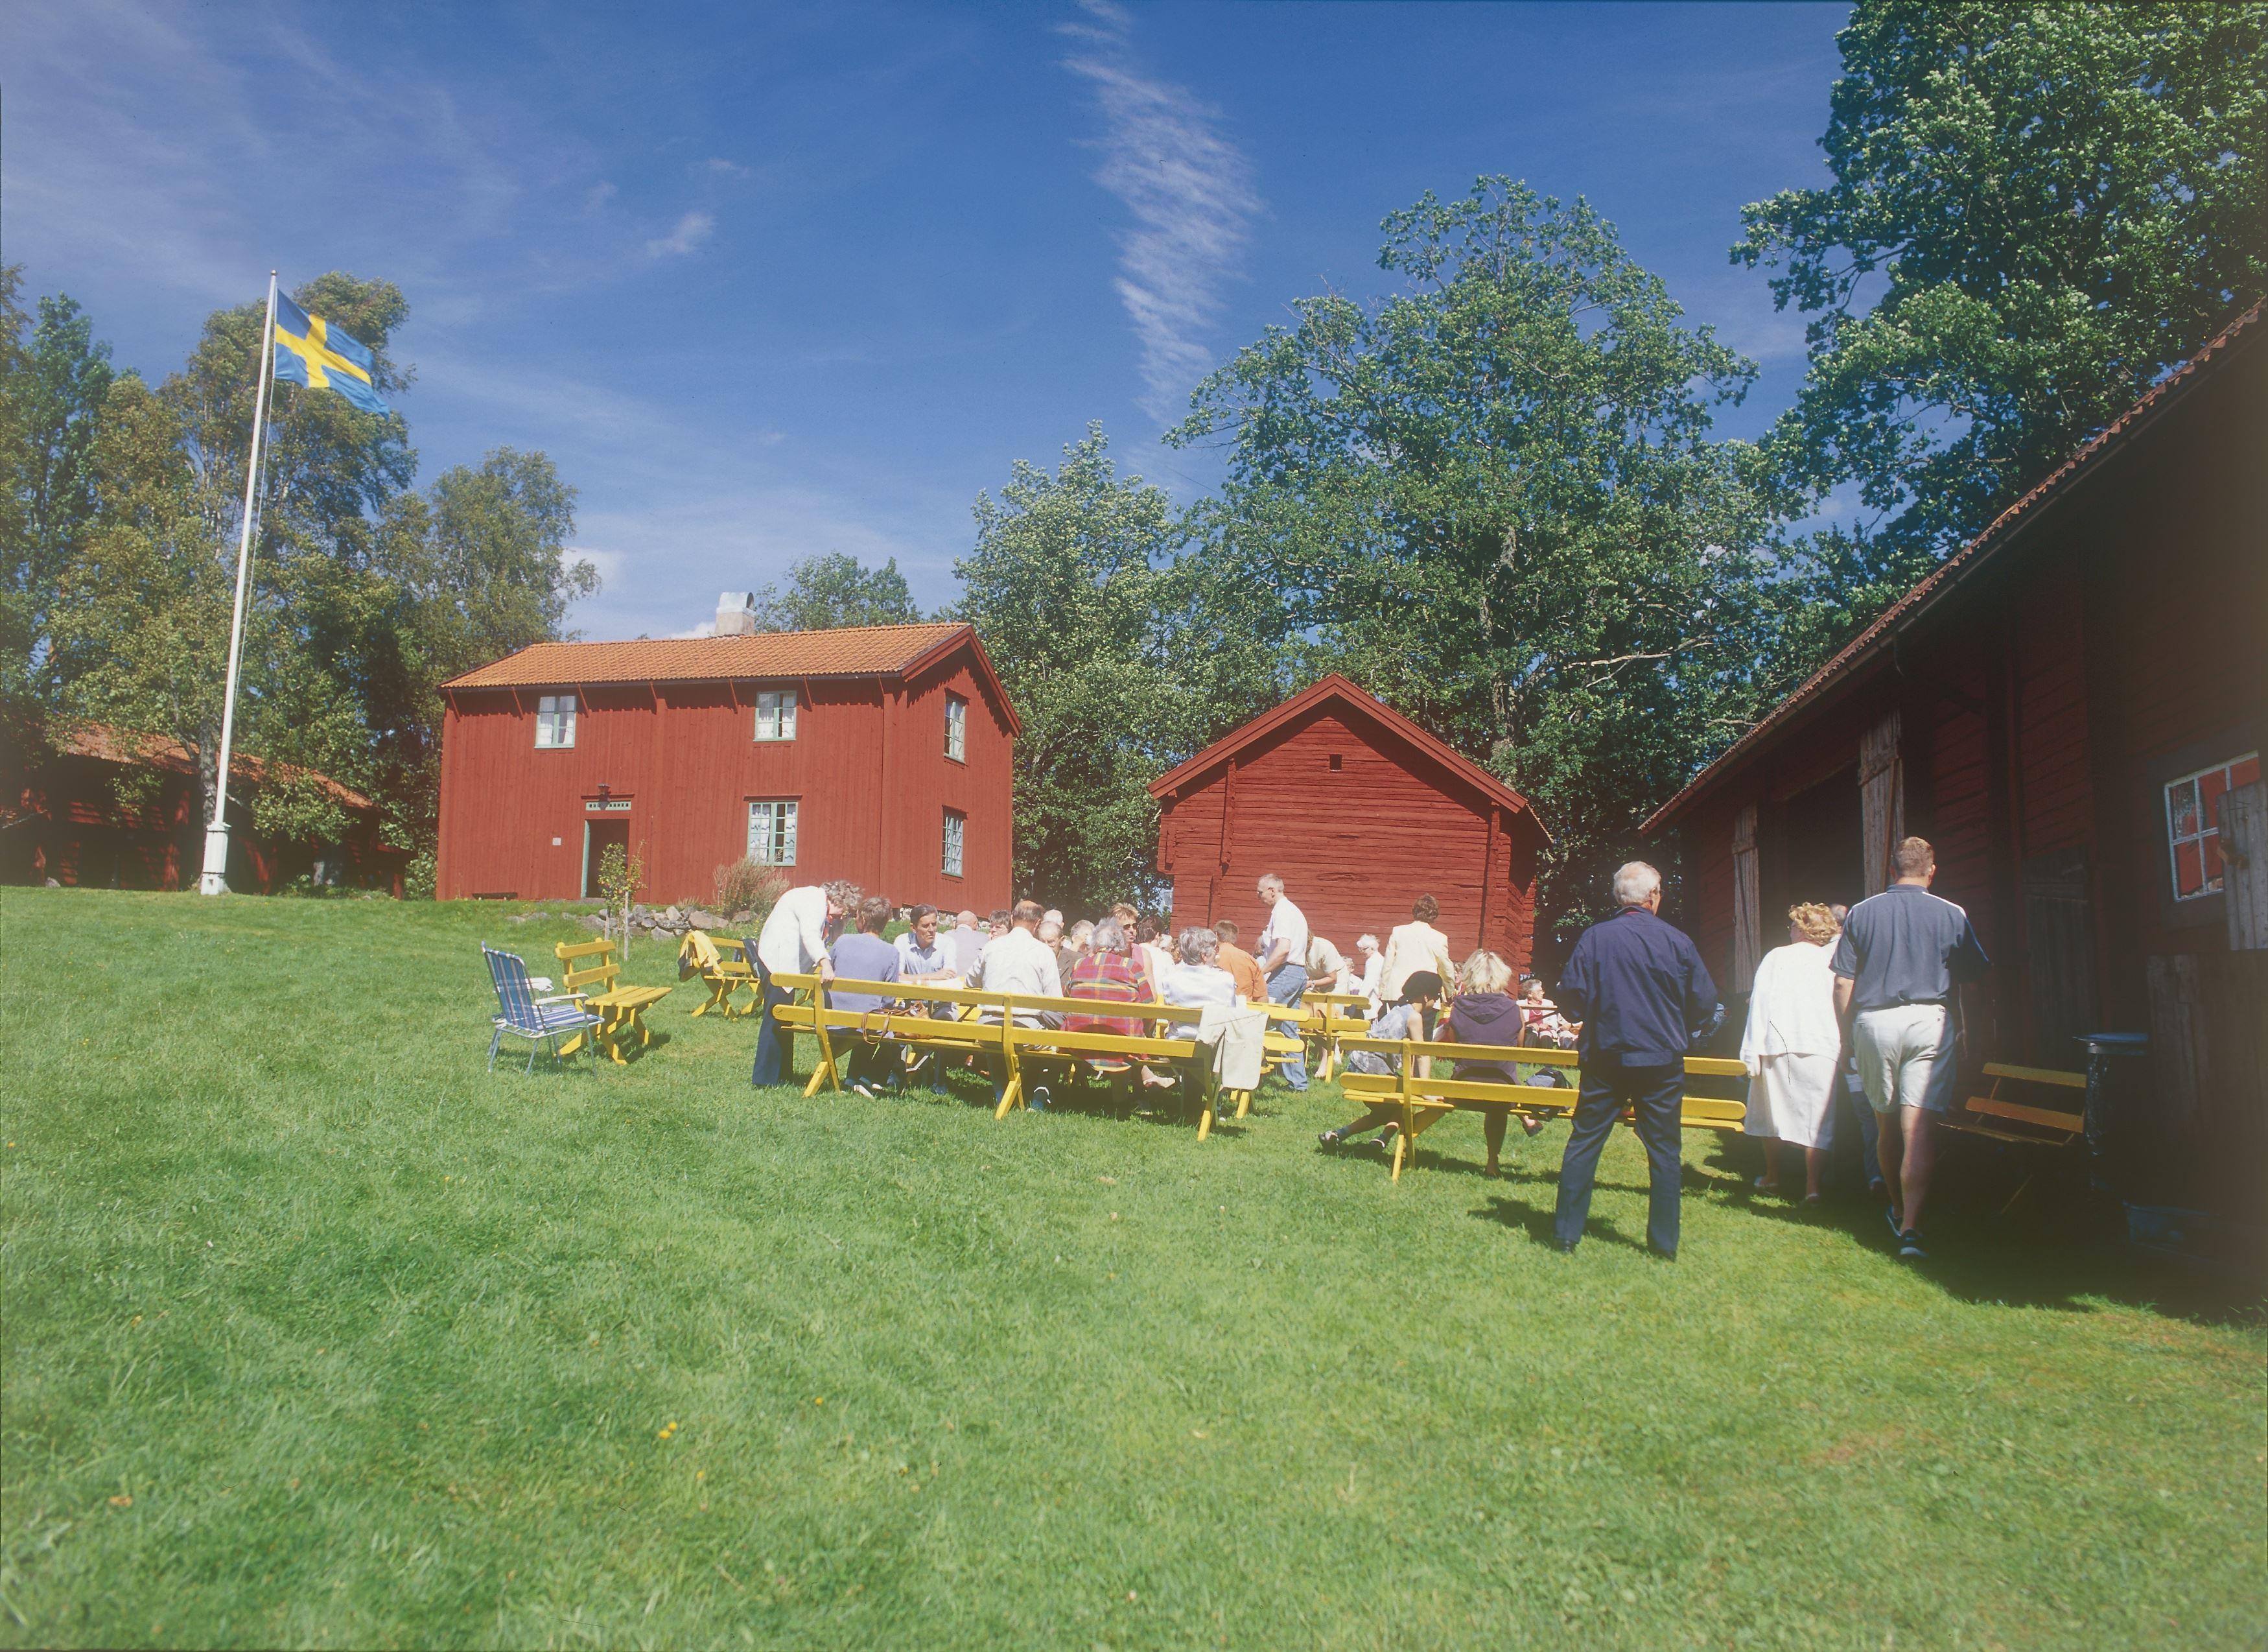 Arbetskvällar i Lönneberga hembygdspark